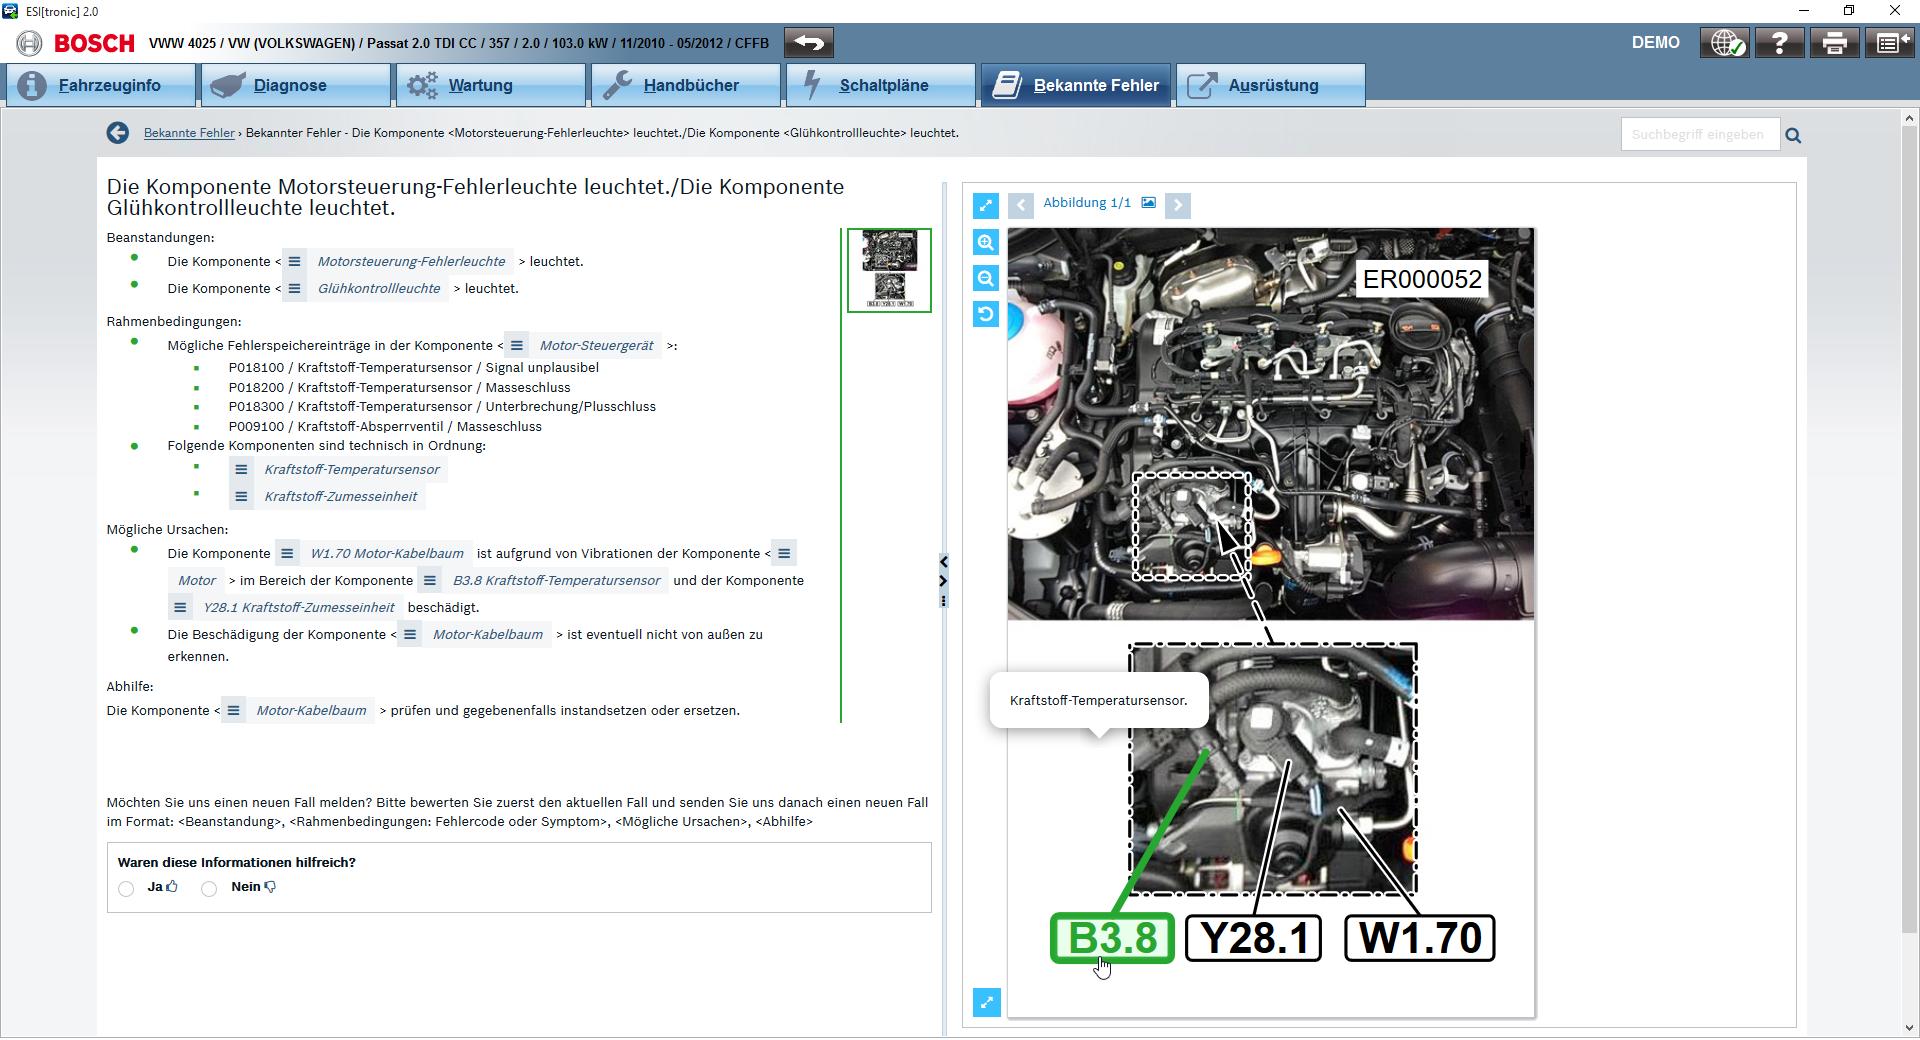 Bosch ESI[tronic] 2.0